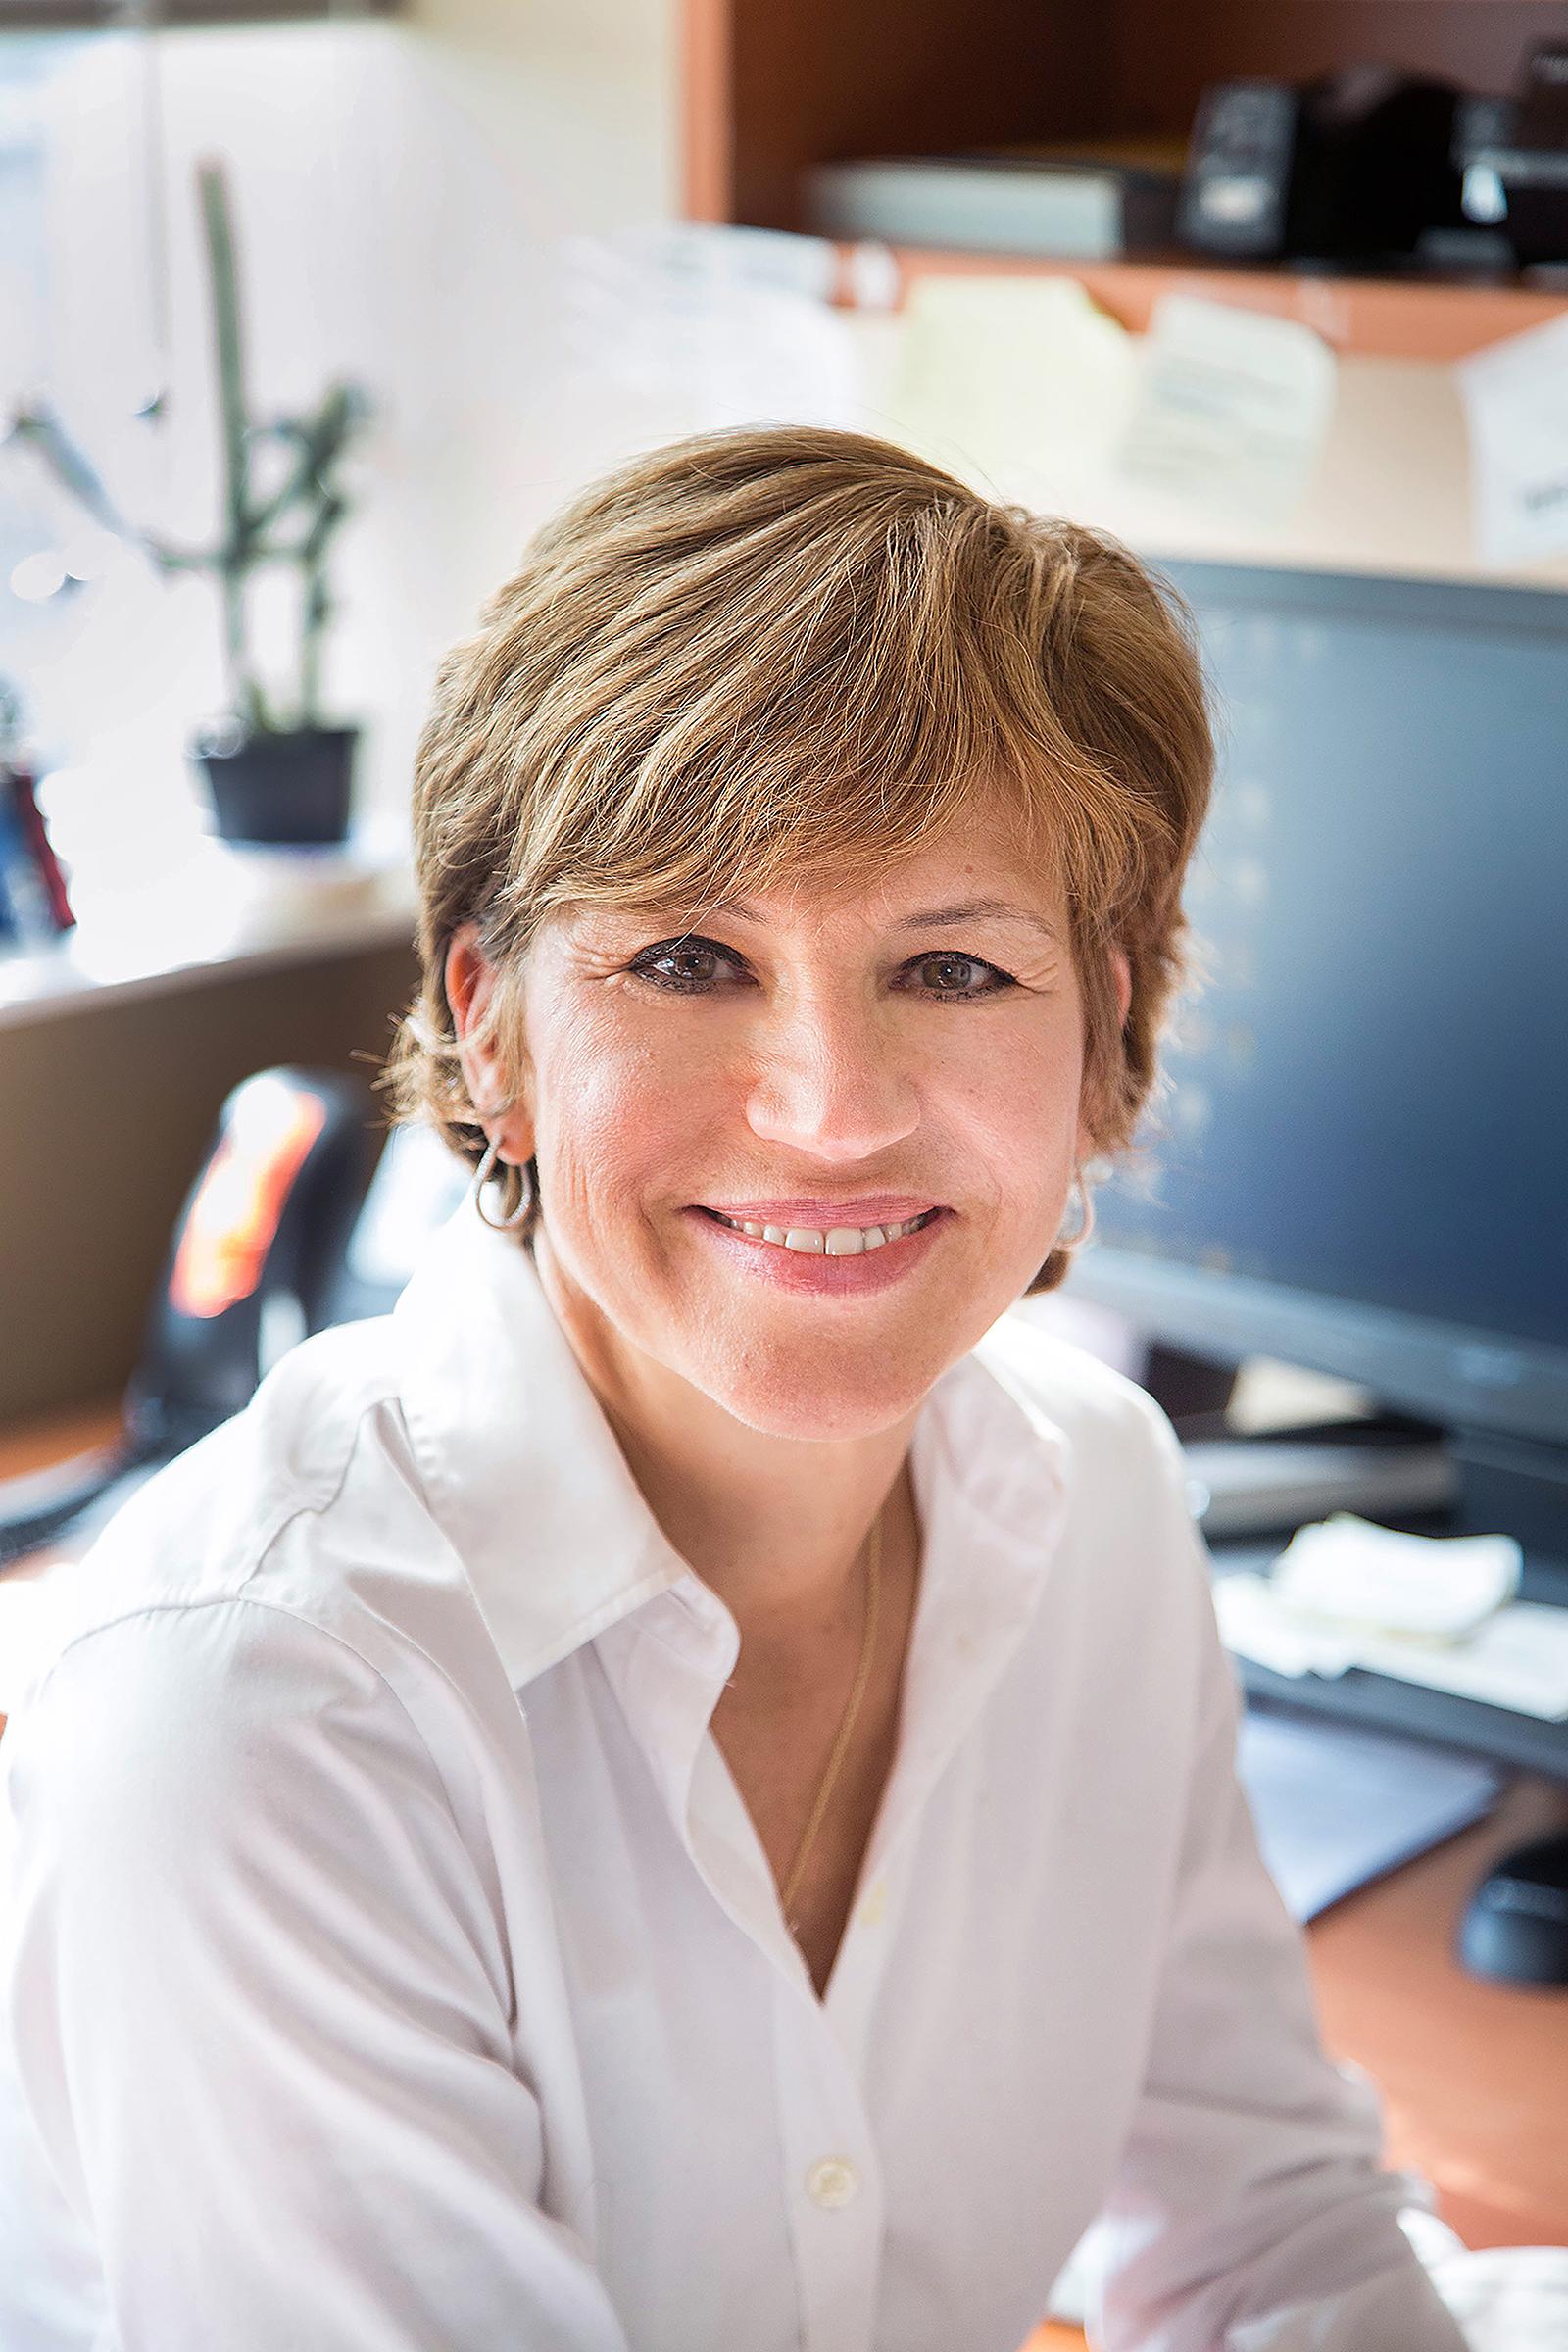 Sharon Zanger Blumenthal, B.S., M.S., PT